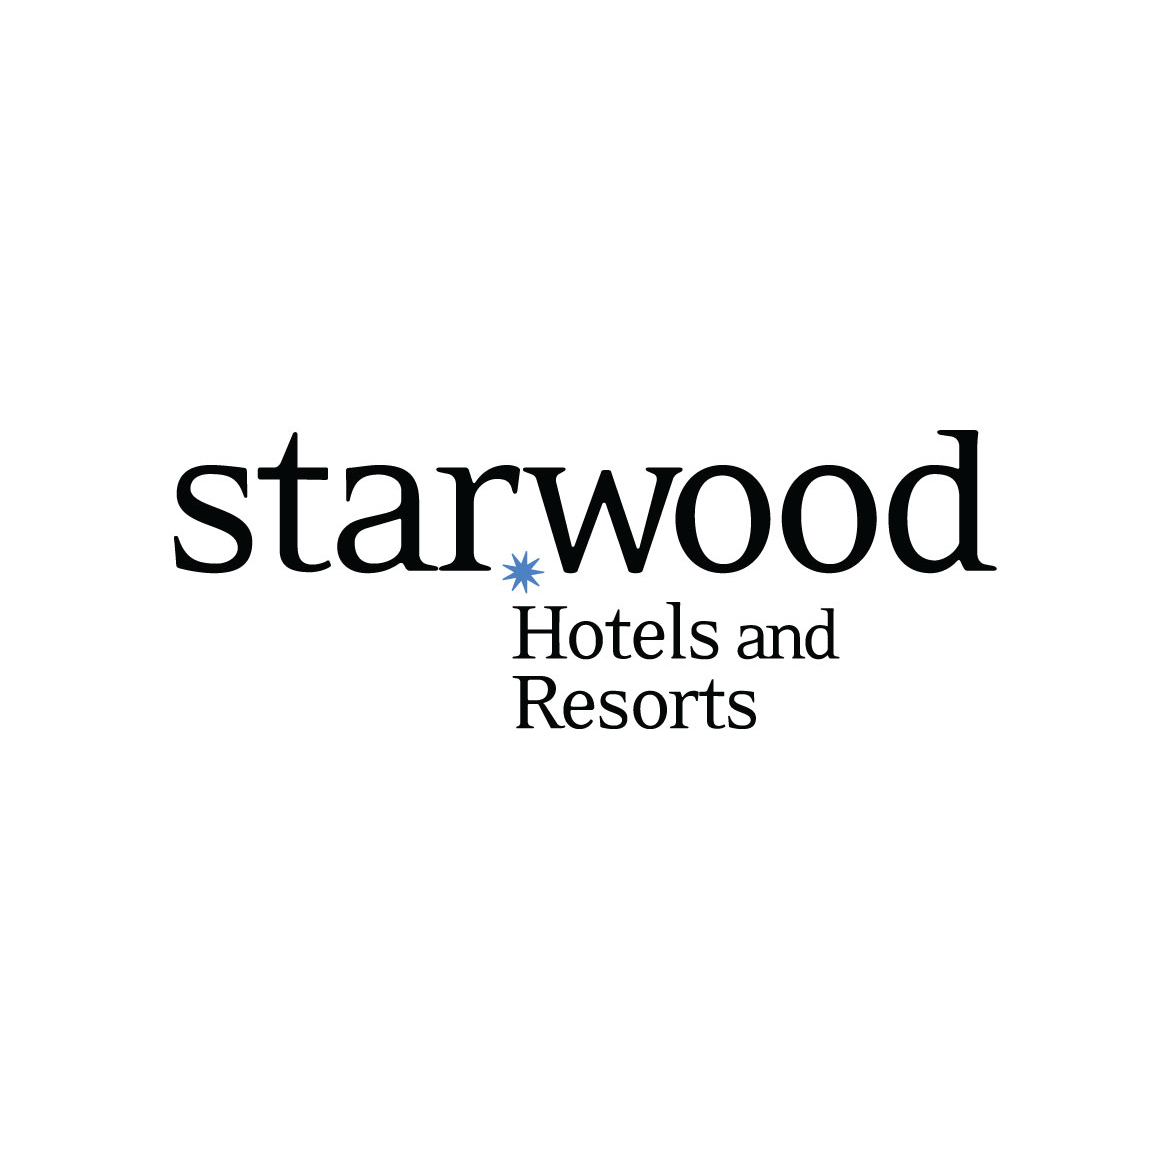 Starwood Hotels & Resorts.jpg